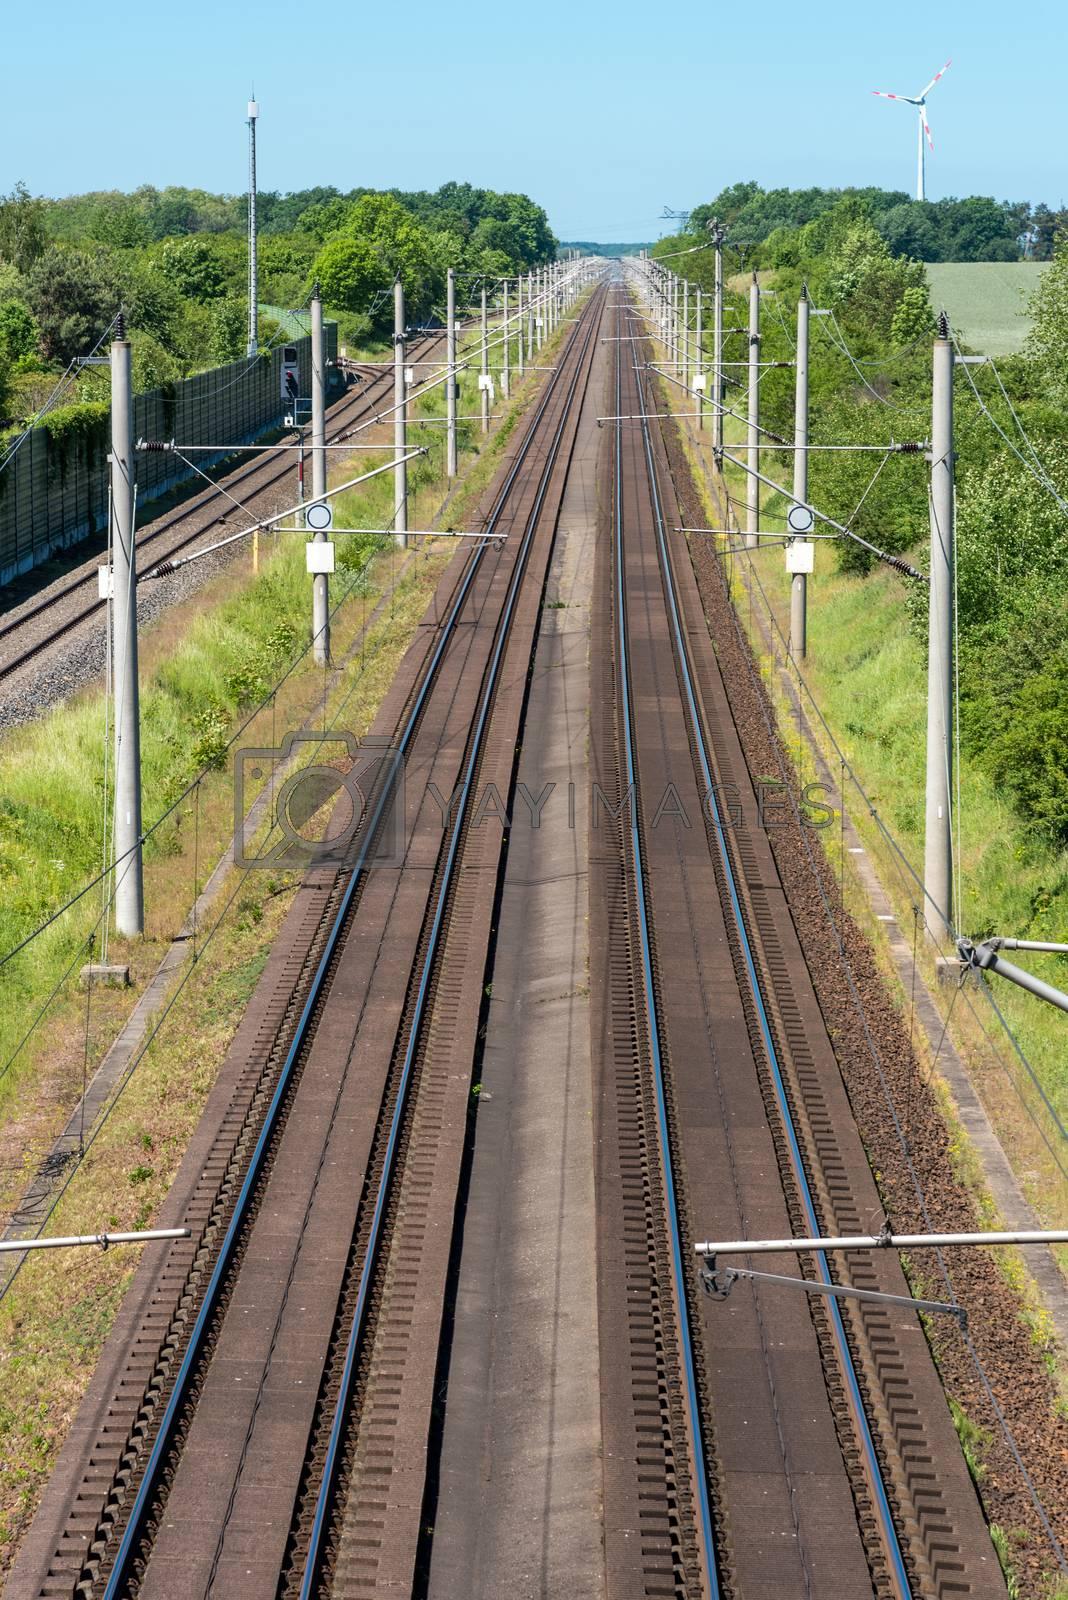 Two highspeed railroad tracks seen in Germany